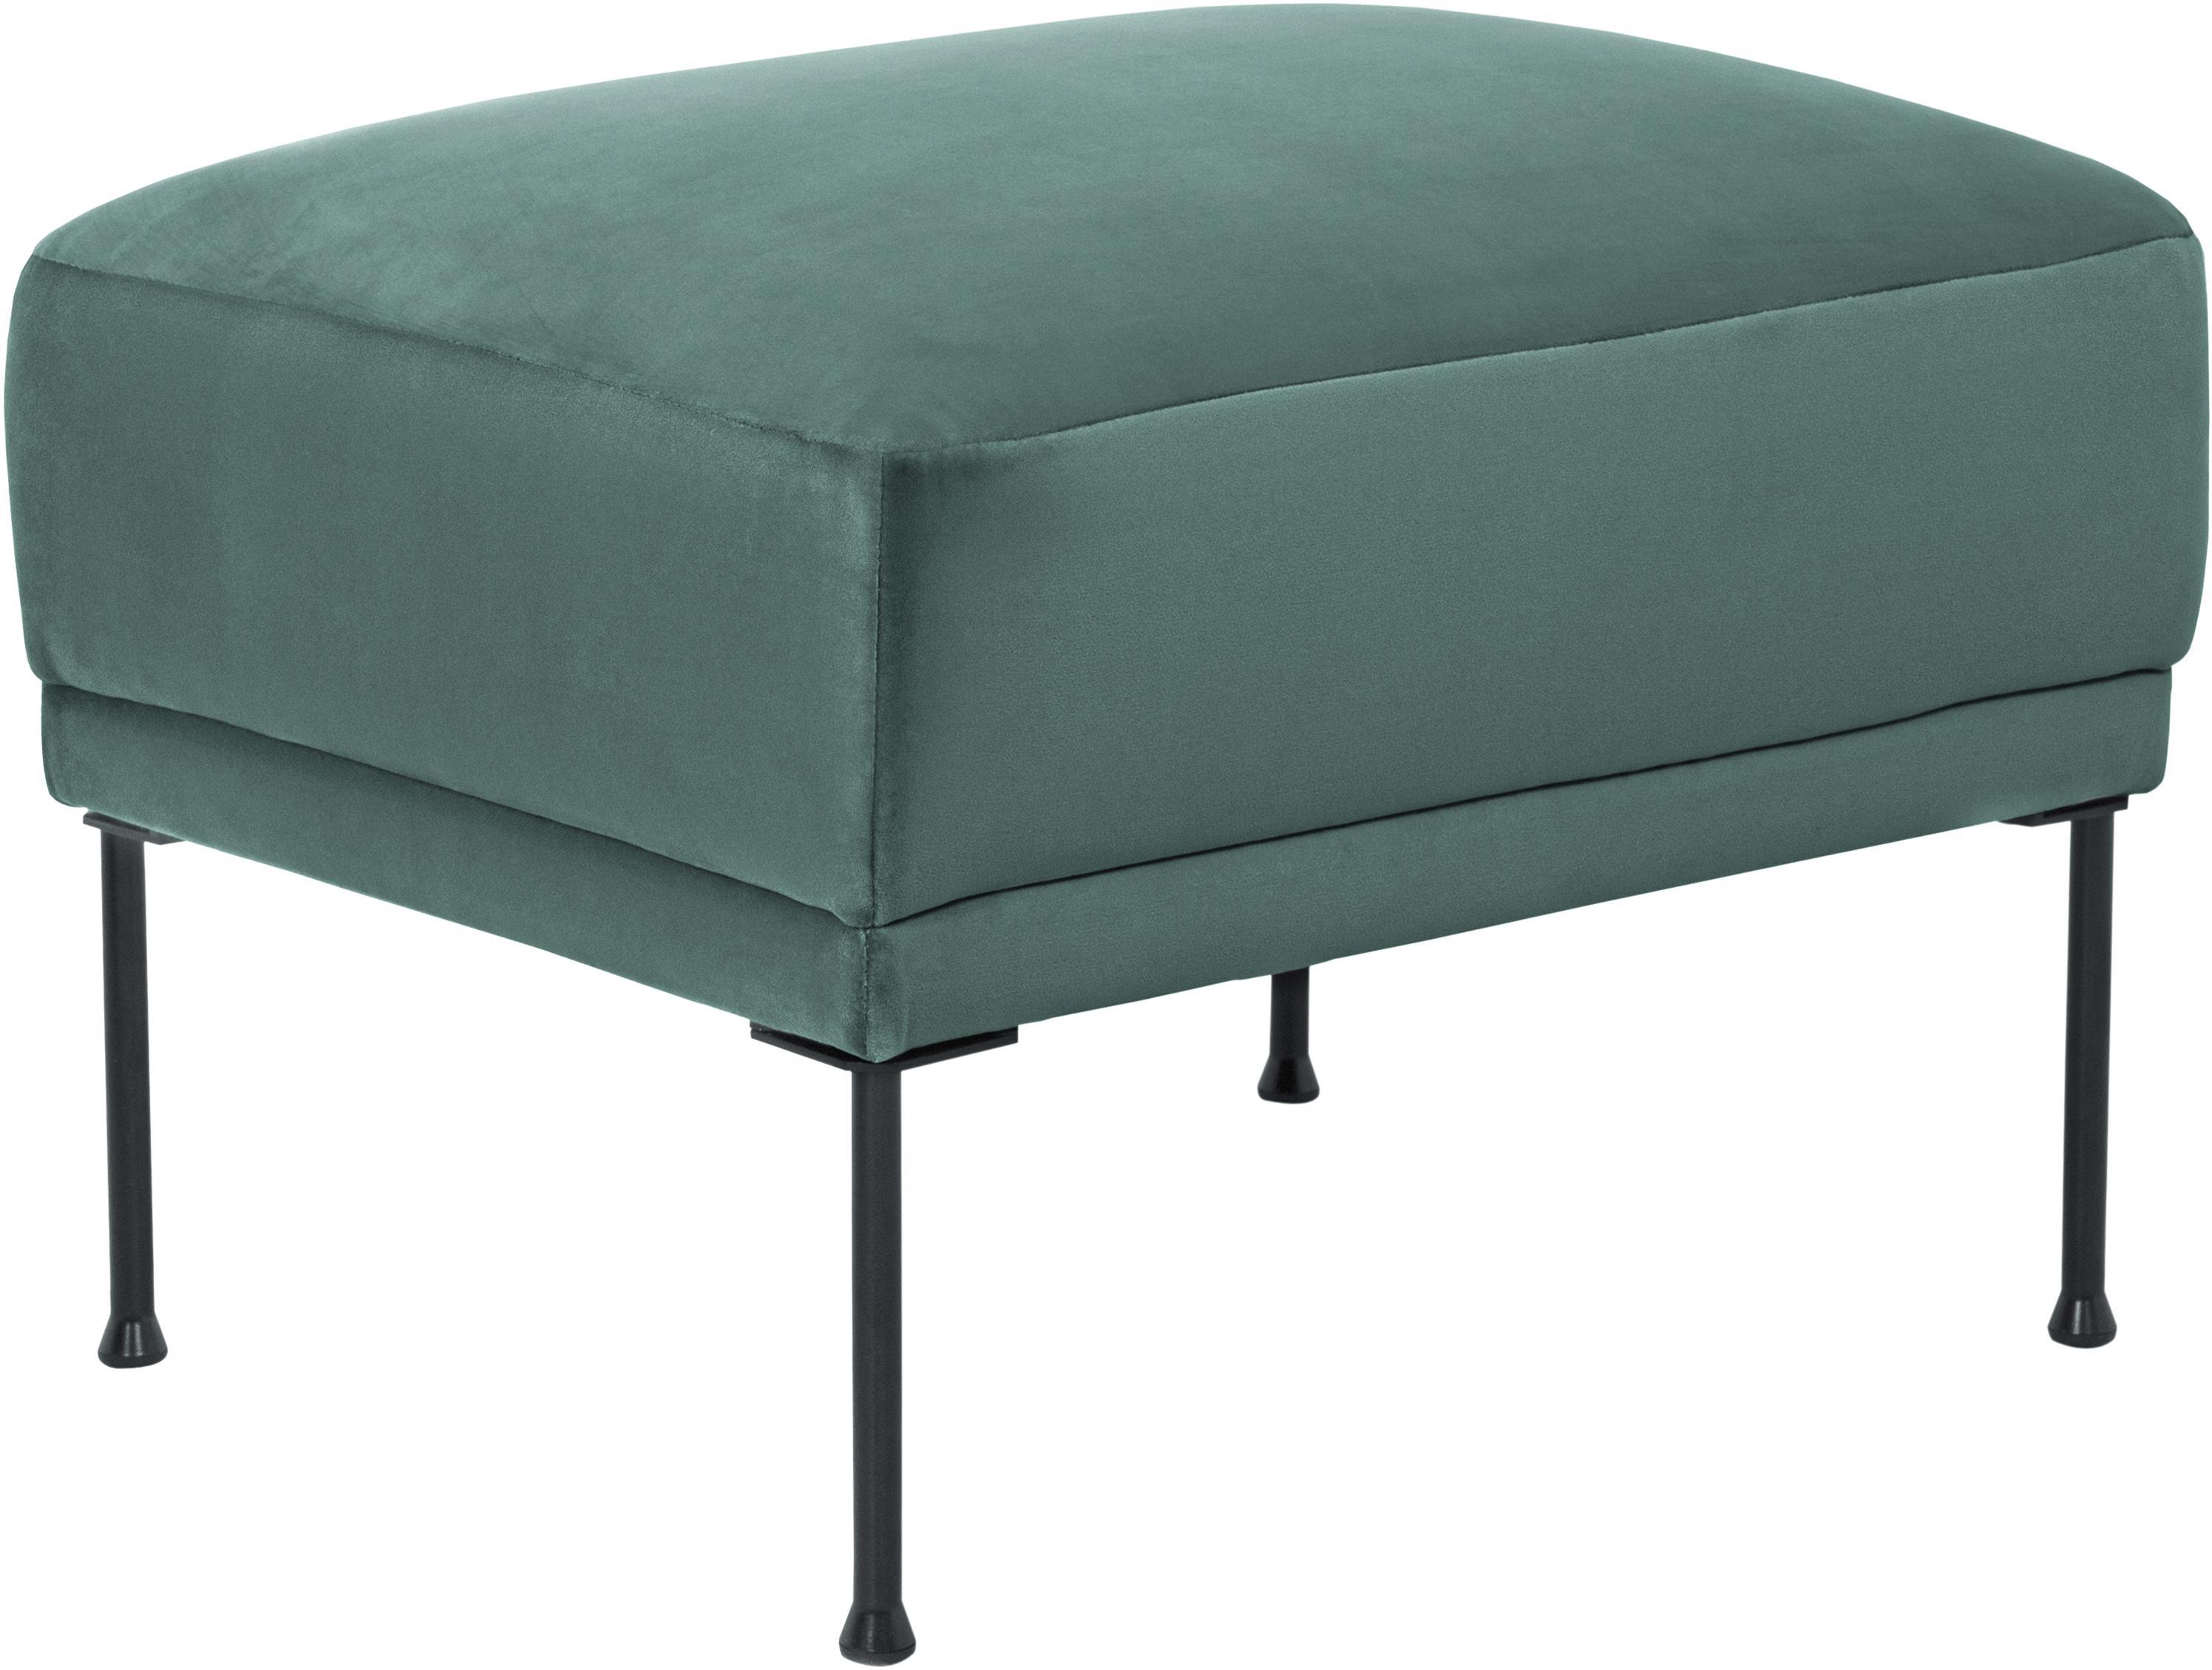 Sofa-Hocker Fluente aus Samt, Bezug: Samt (Hochwertiger Polyes, Gestell: Massives Kiefernholz, Samt Hellgrün, 62 x 46 cm